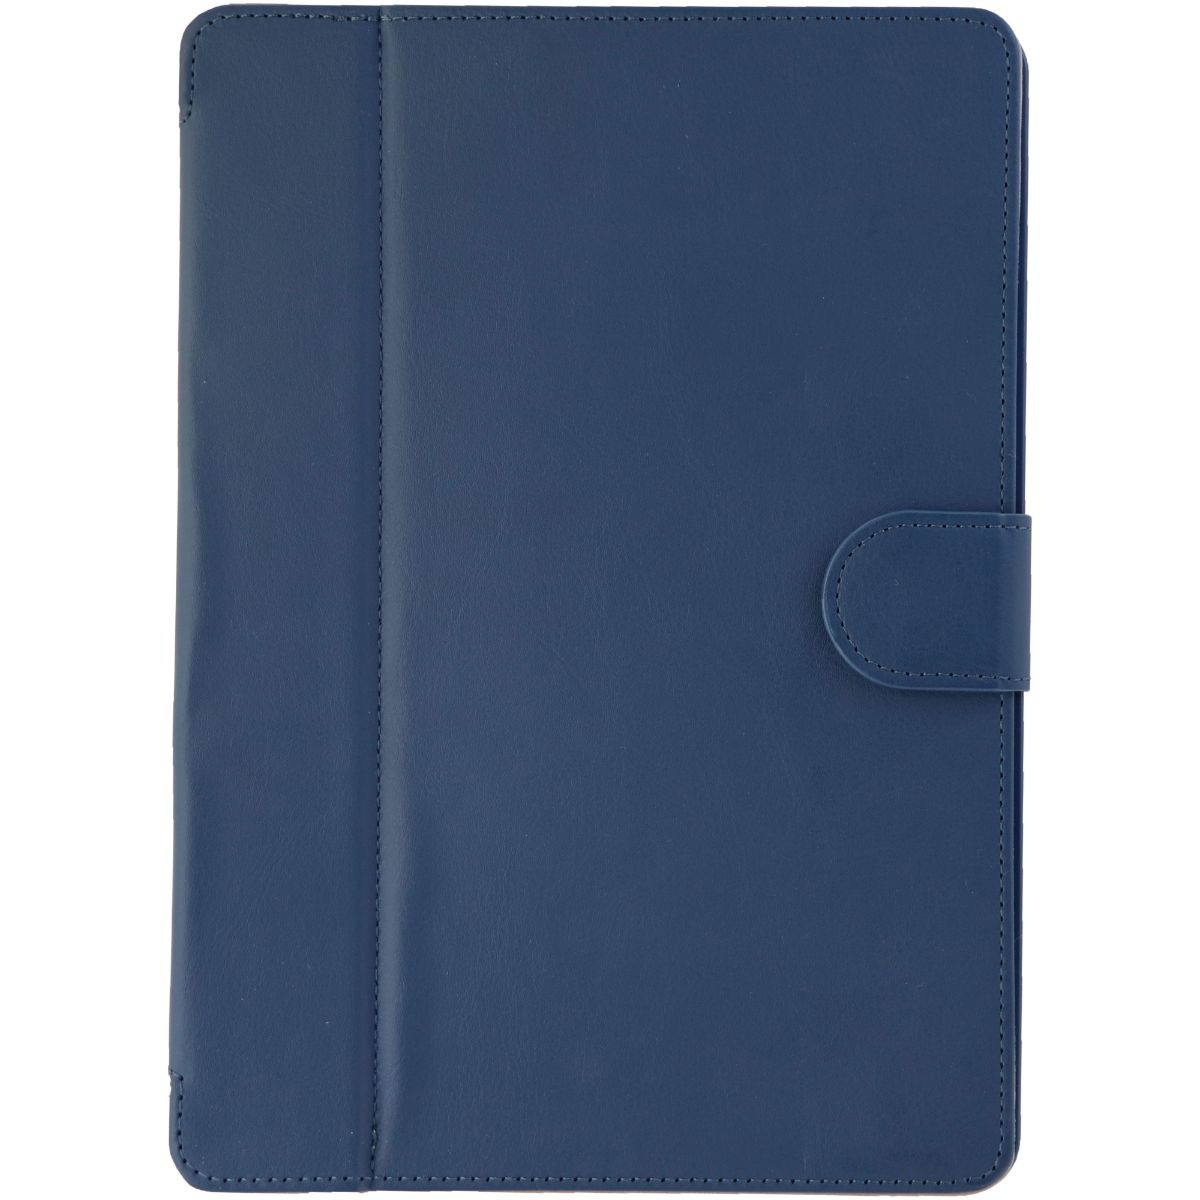 Verizon Folio Tablet Case for Apple iPad Pro 9.7 - Blue - IPADAIRNCASBLU